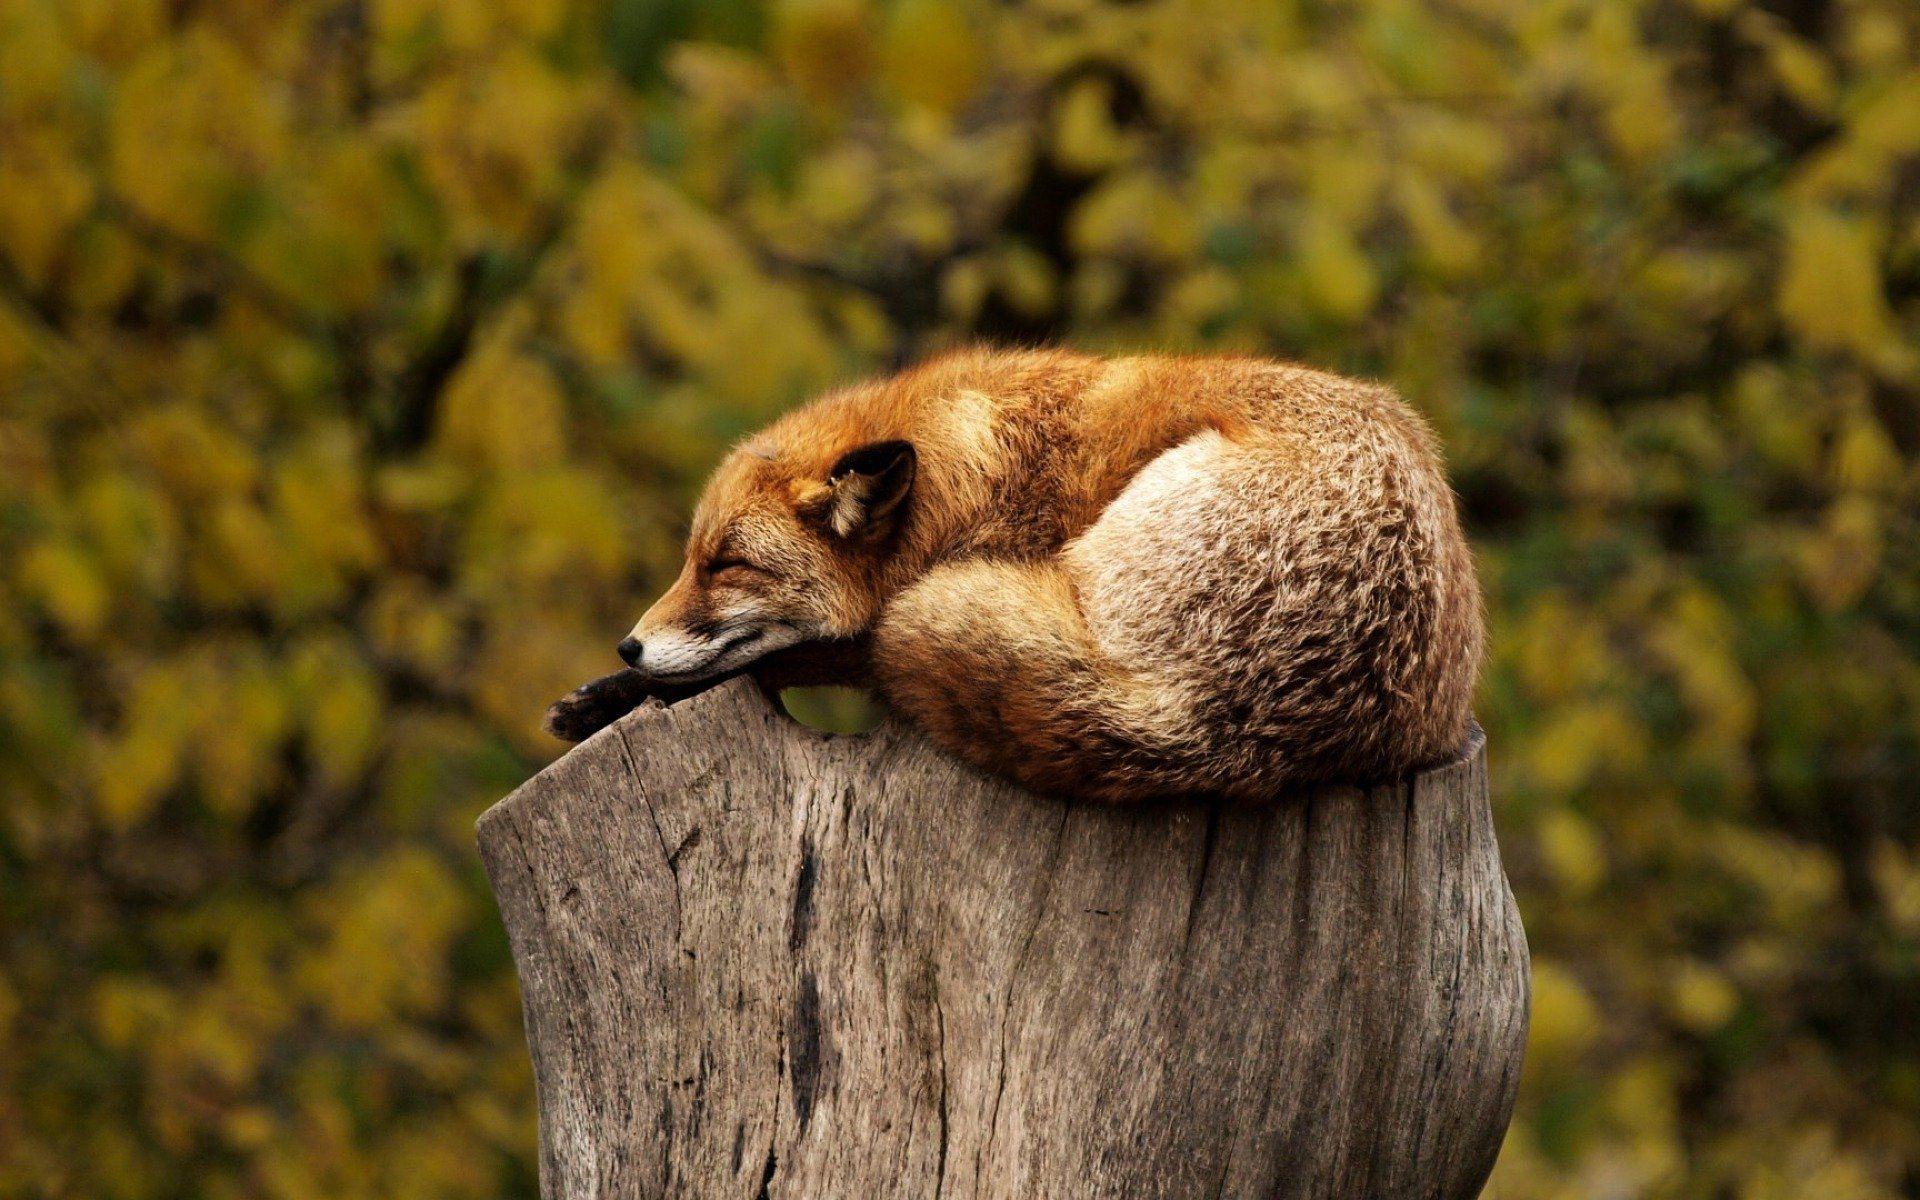 Fox sleeping on a log